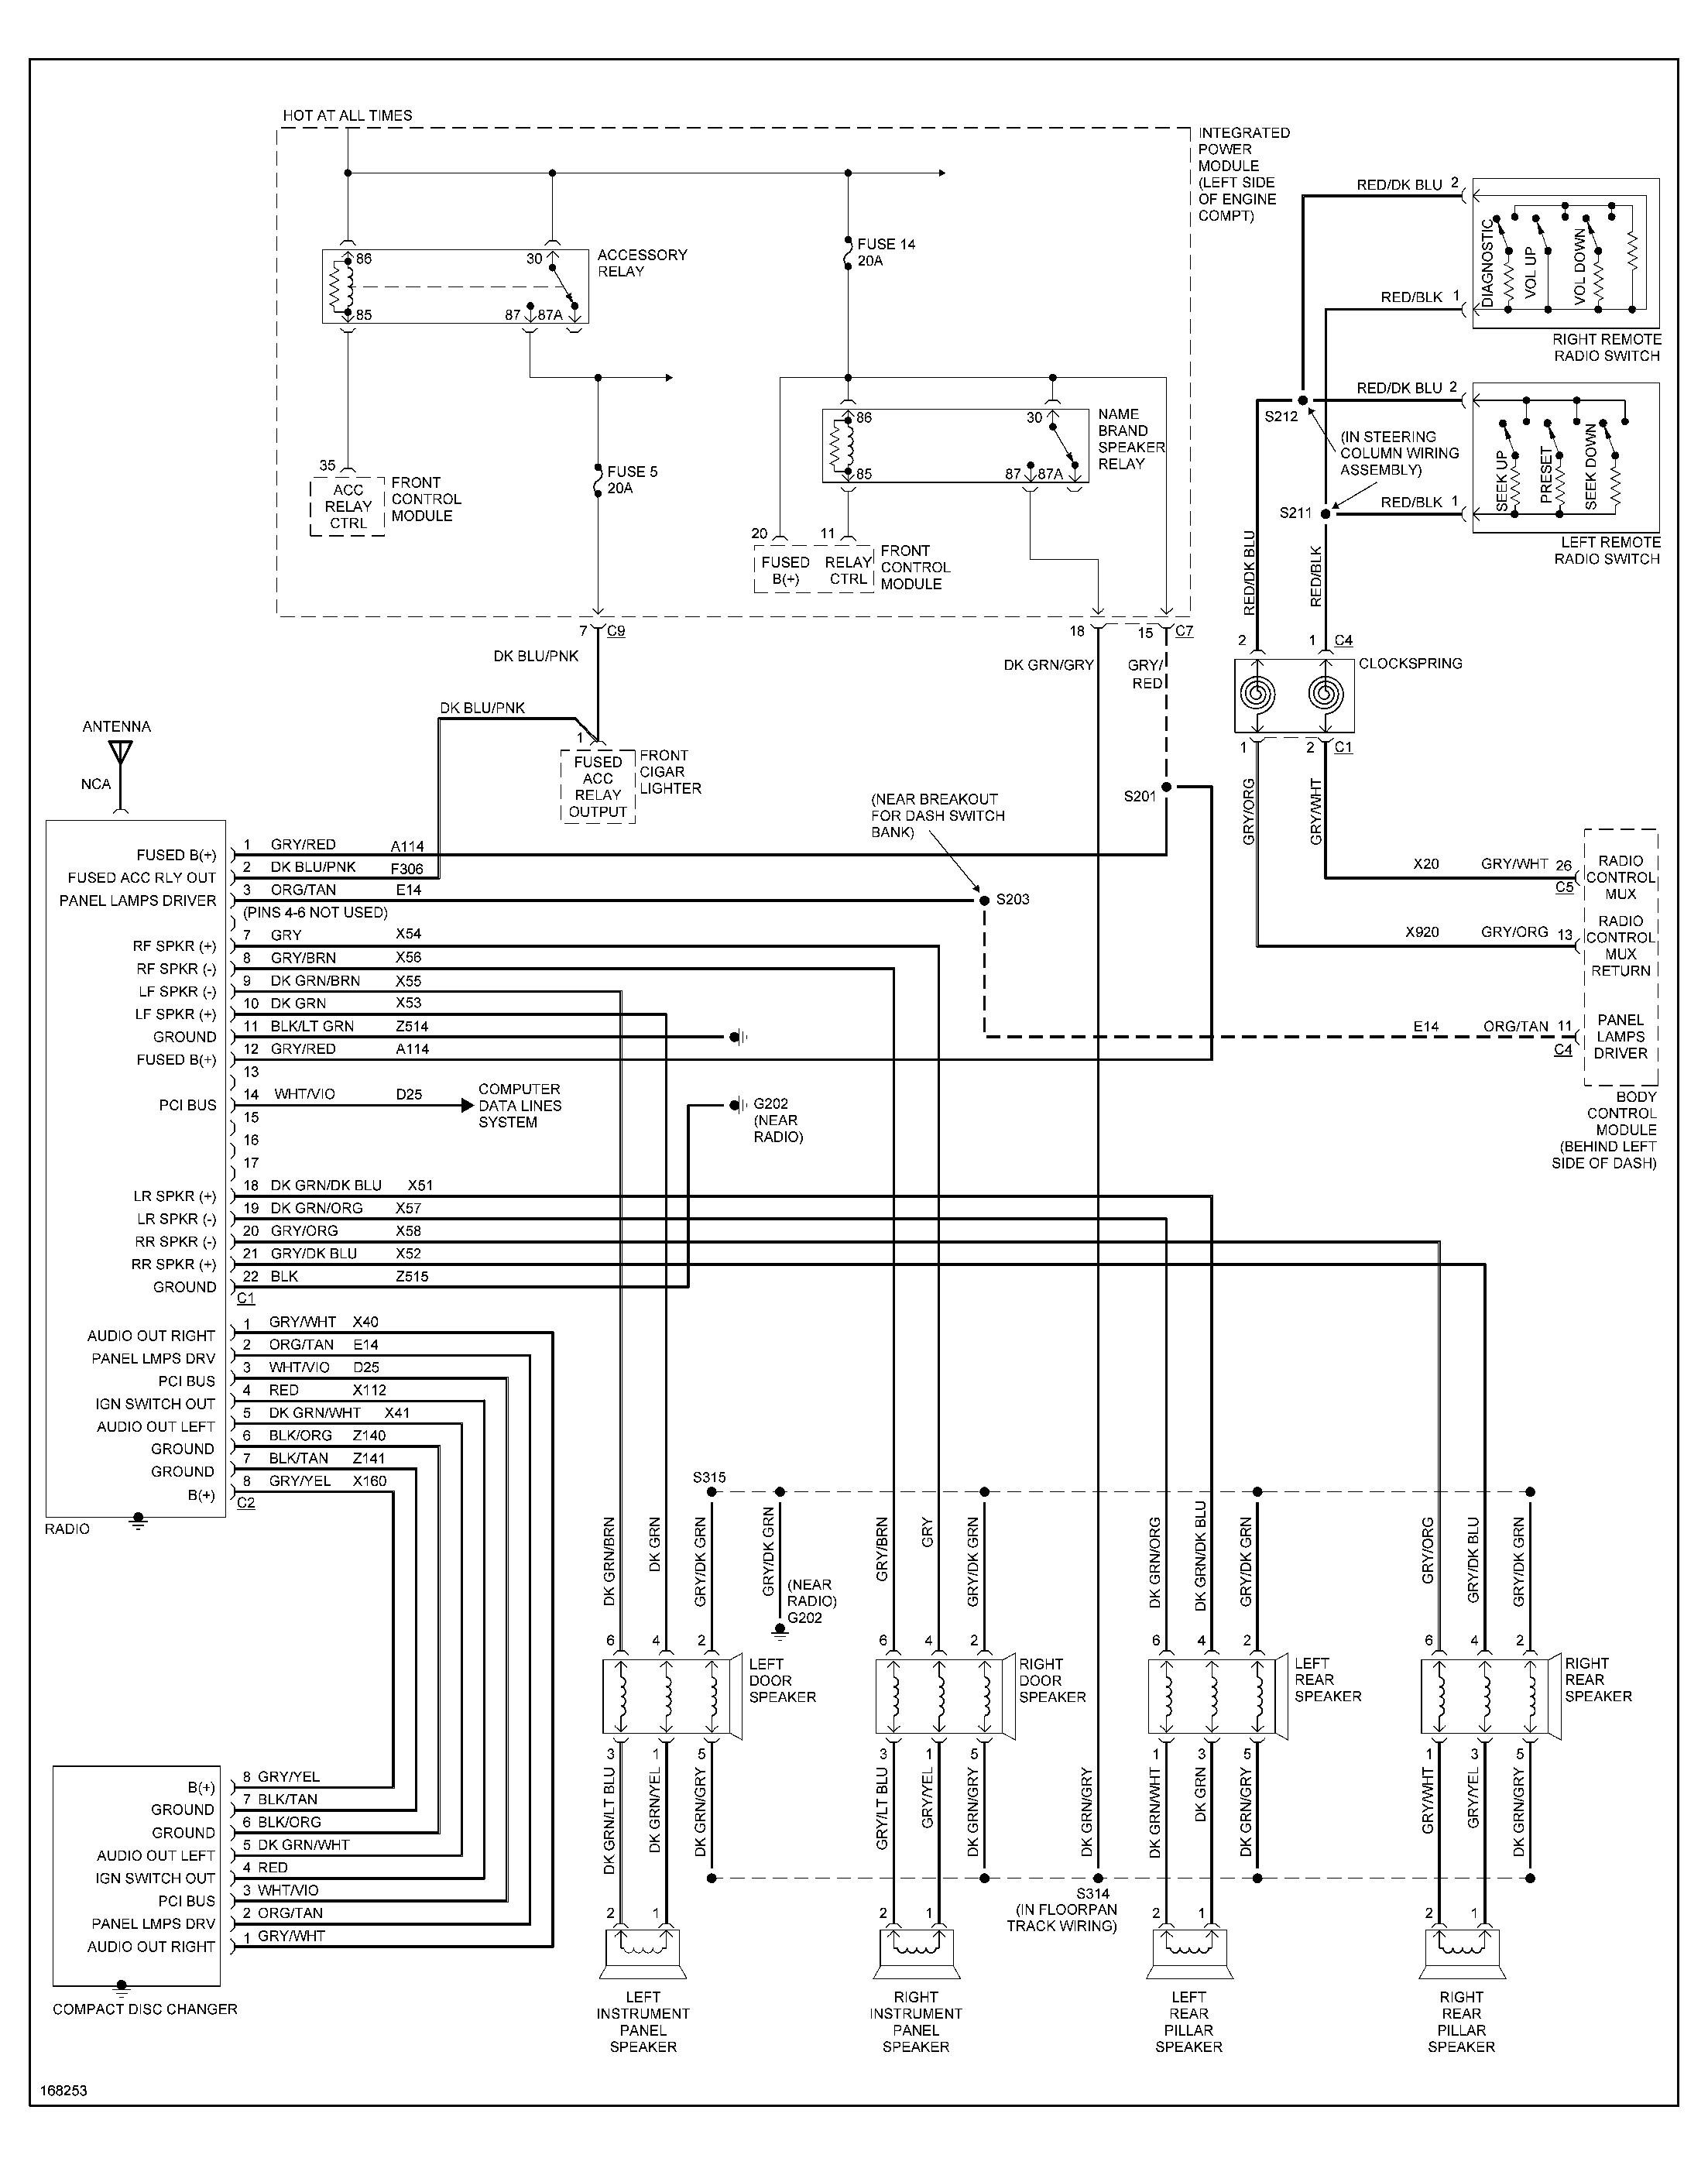 2007 grand caravan wiring diagram wiring diagram id creative caravan wiring diagram